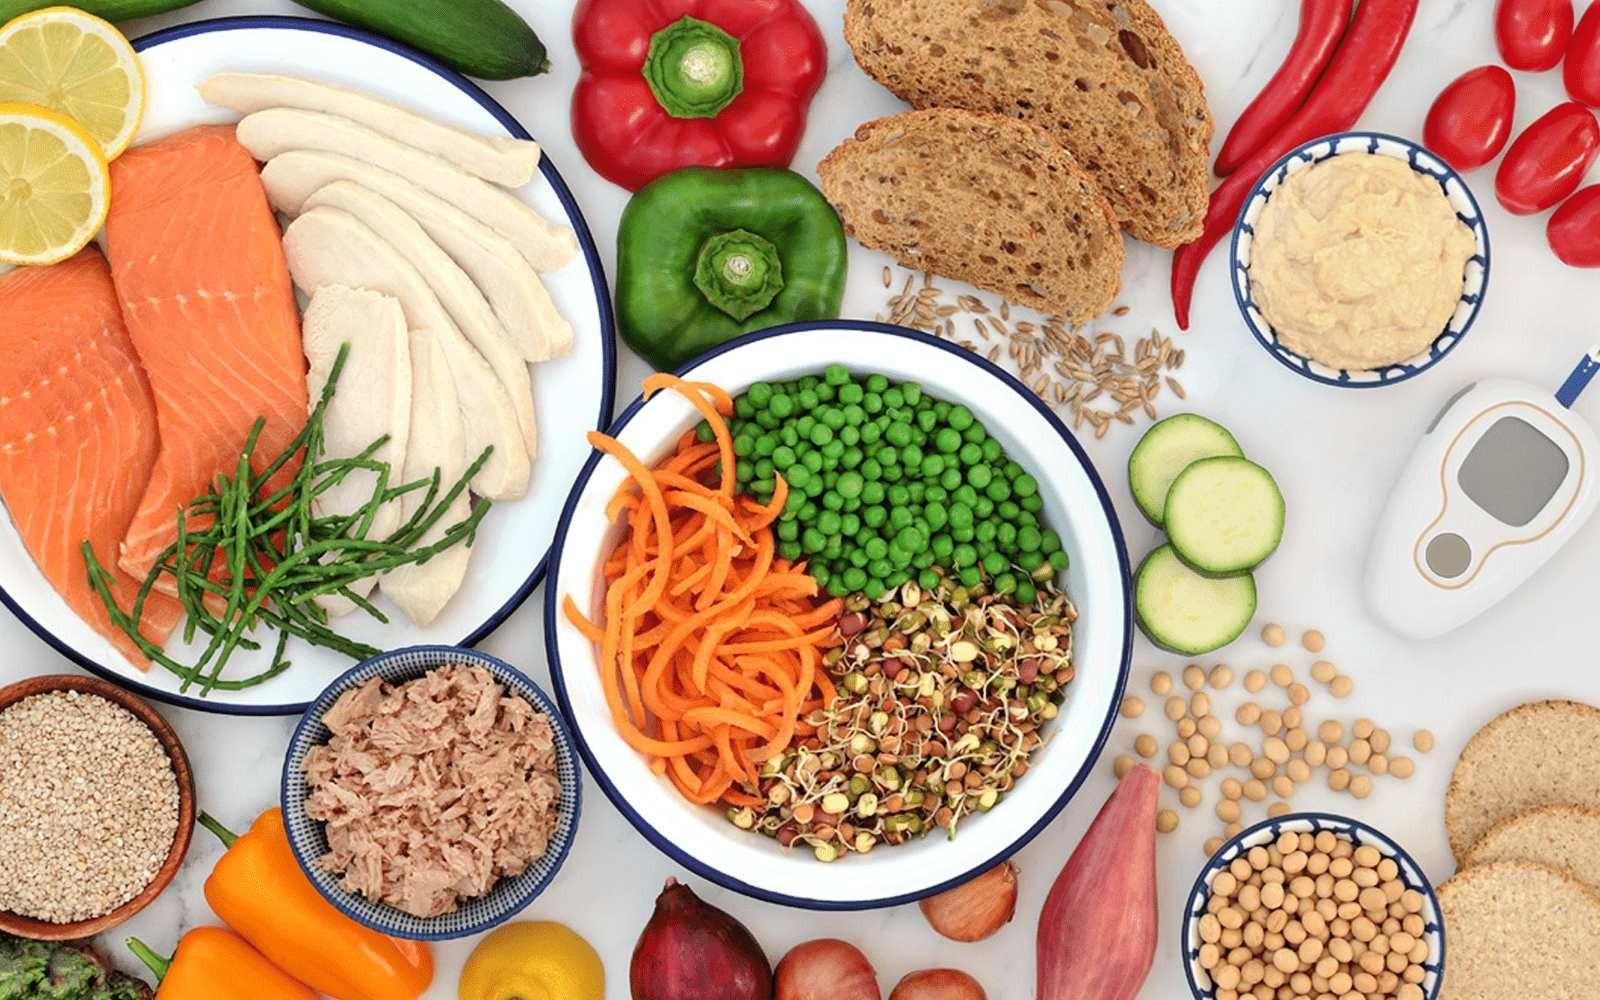 Menjaga Kadar Gula Darah dengan Karbohidrat Lepas Lambat